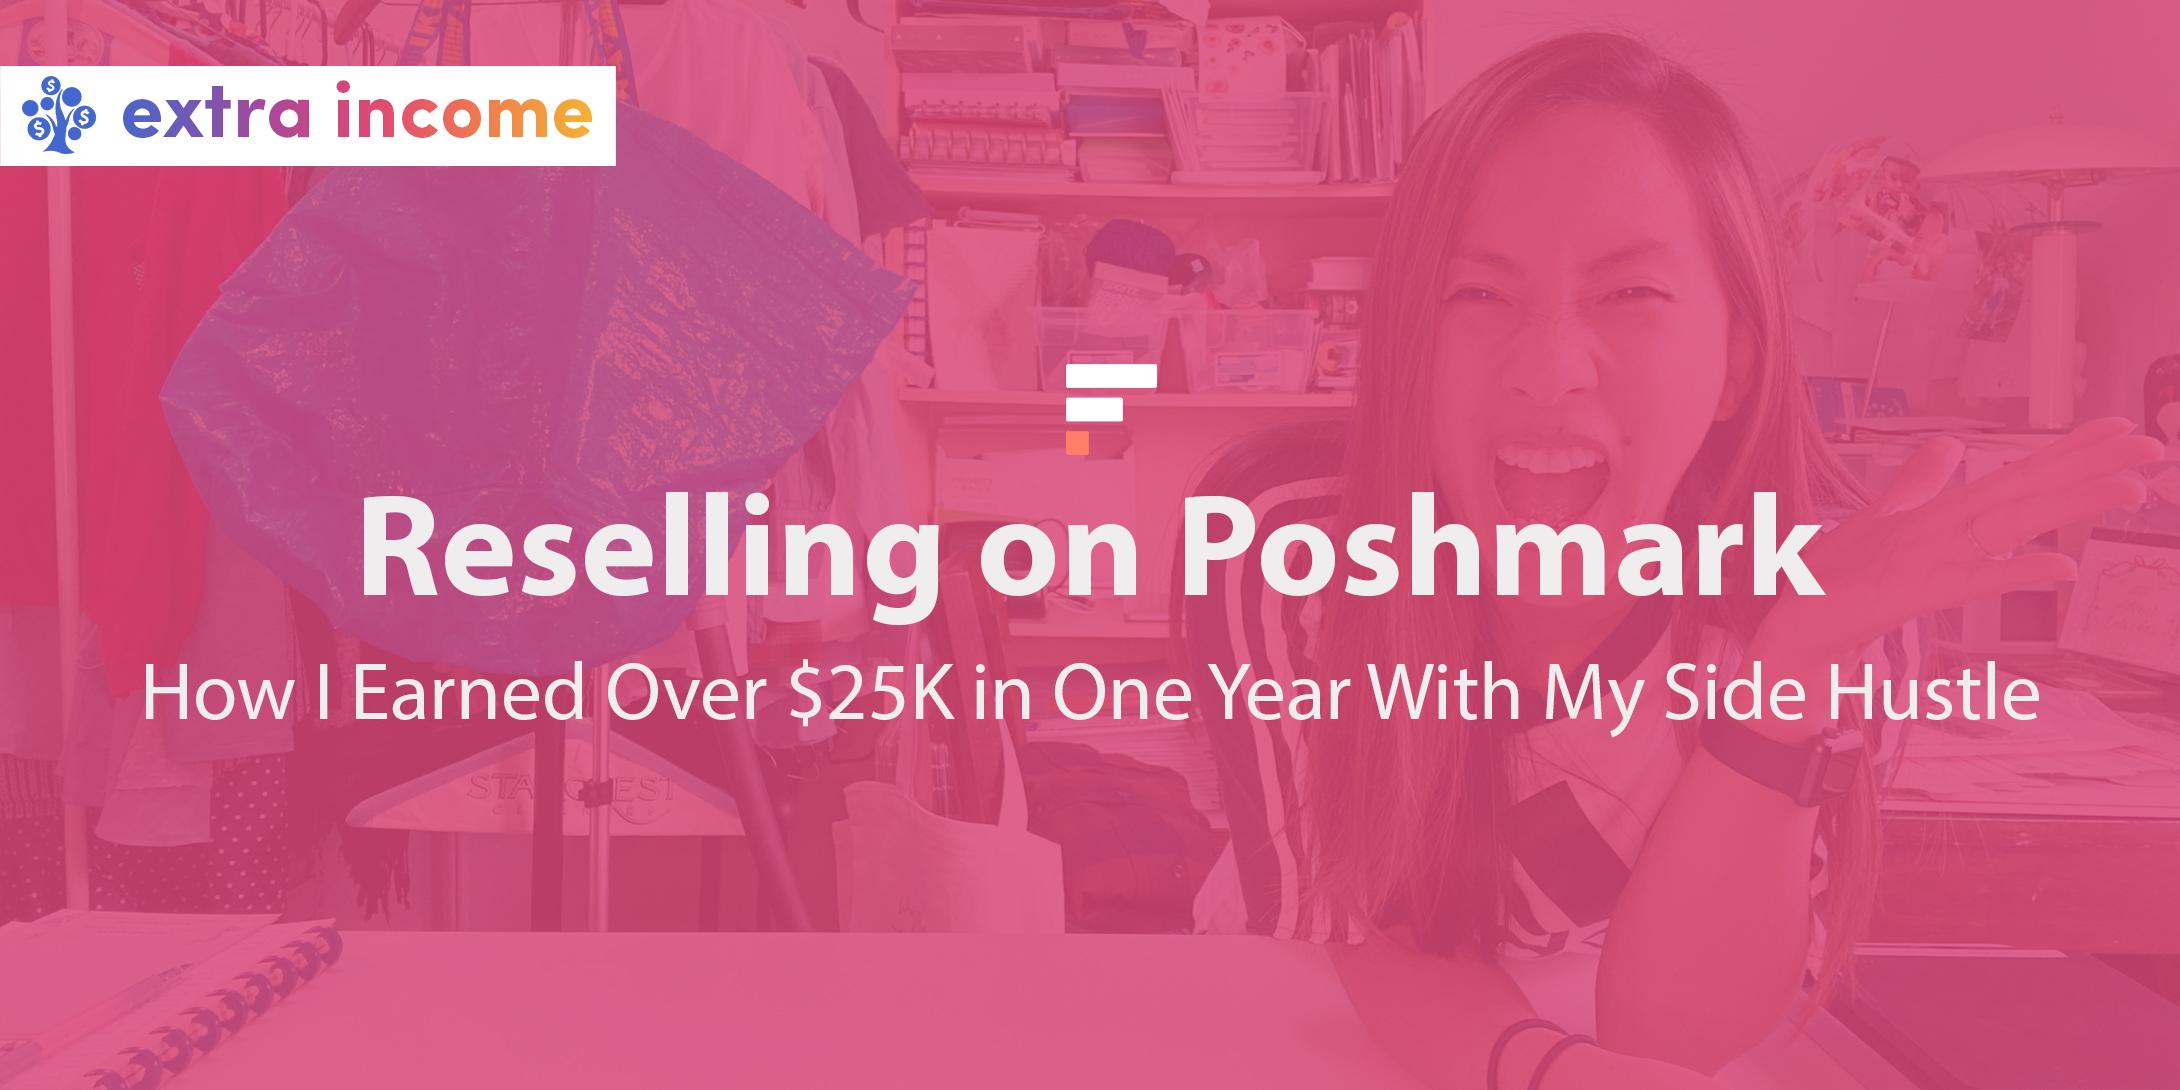 Reselling on Poshmark